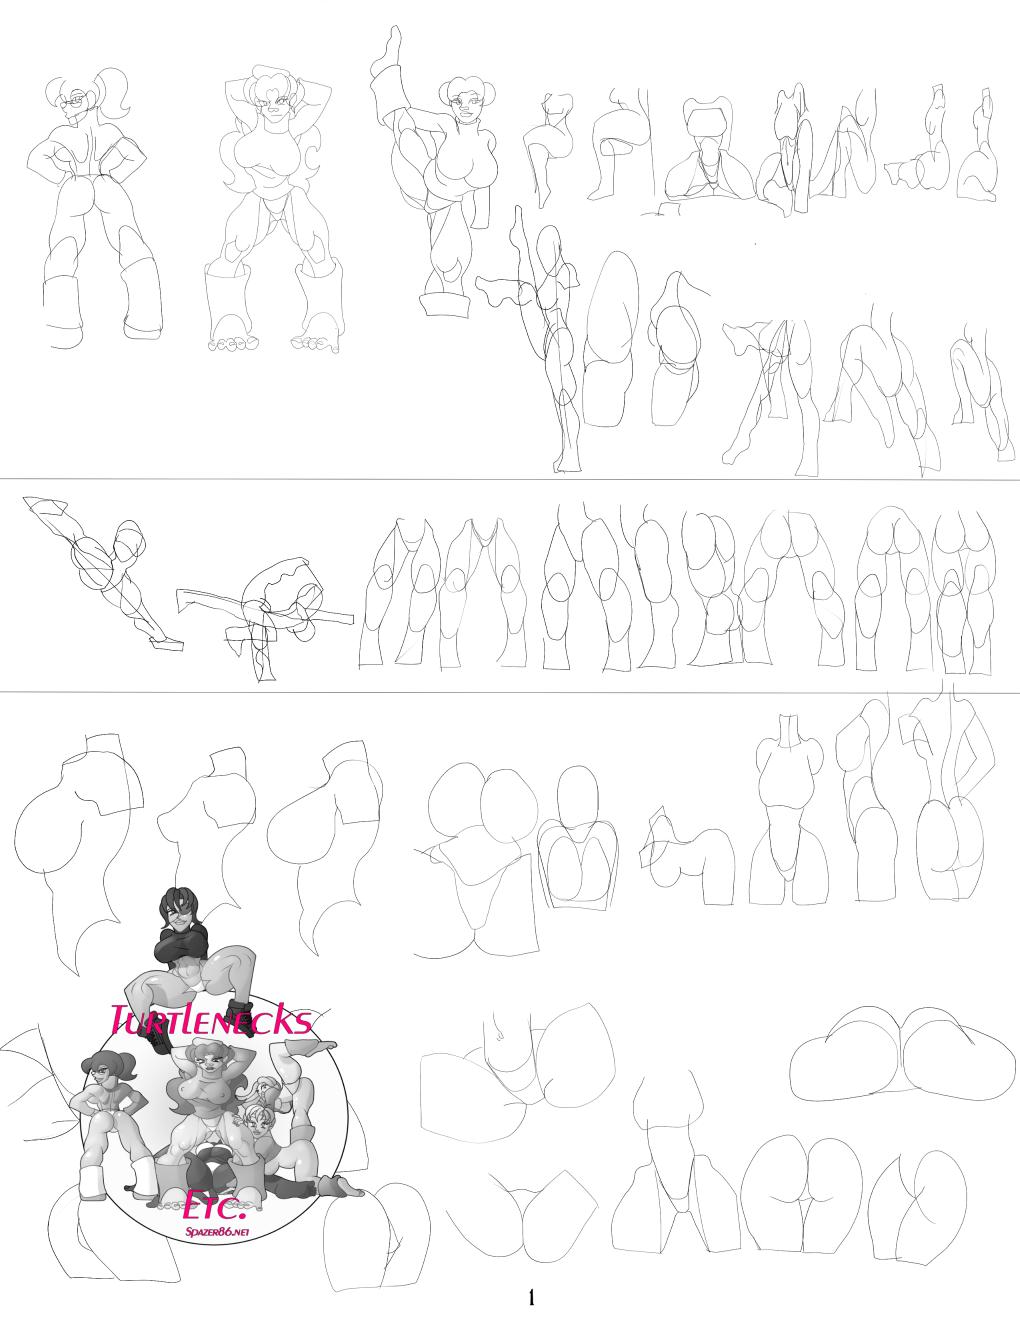 Turtlenecks sketches page 1